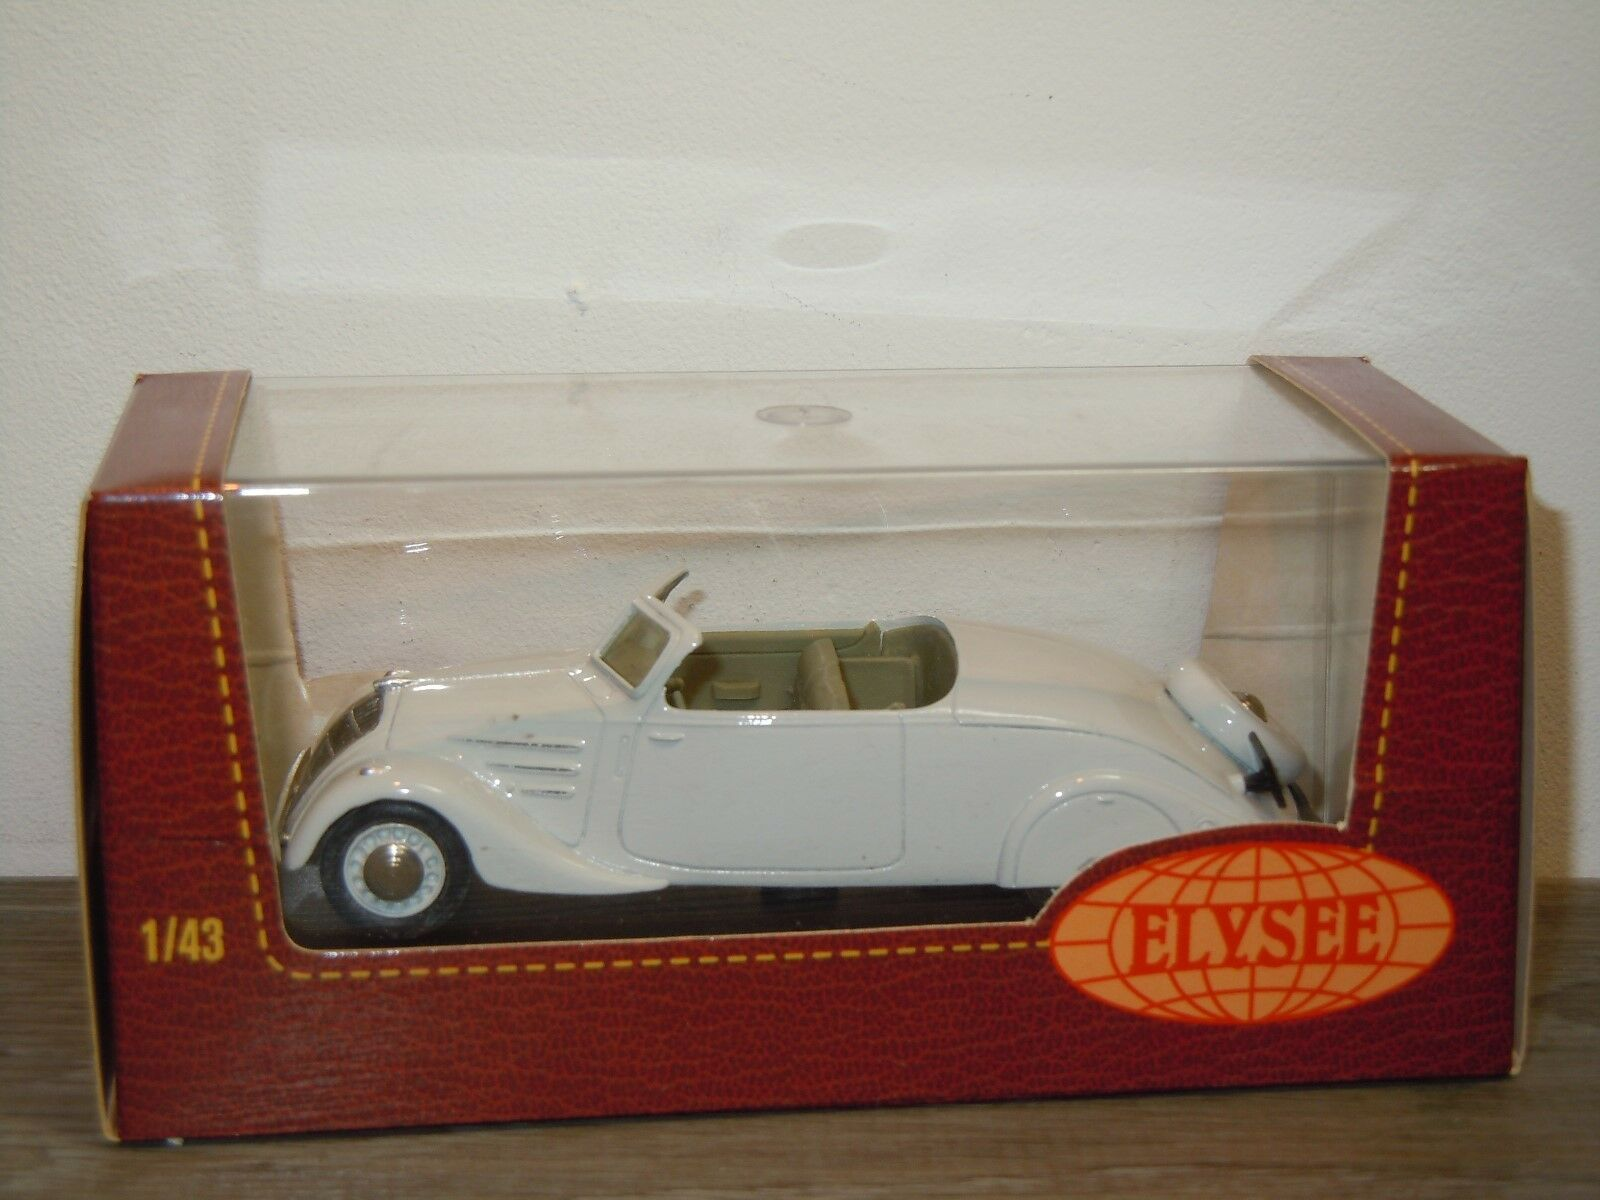 Peugeot 402 eclypse 1936 - elysee - 532 frankreich 1 43 in kasten  35327